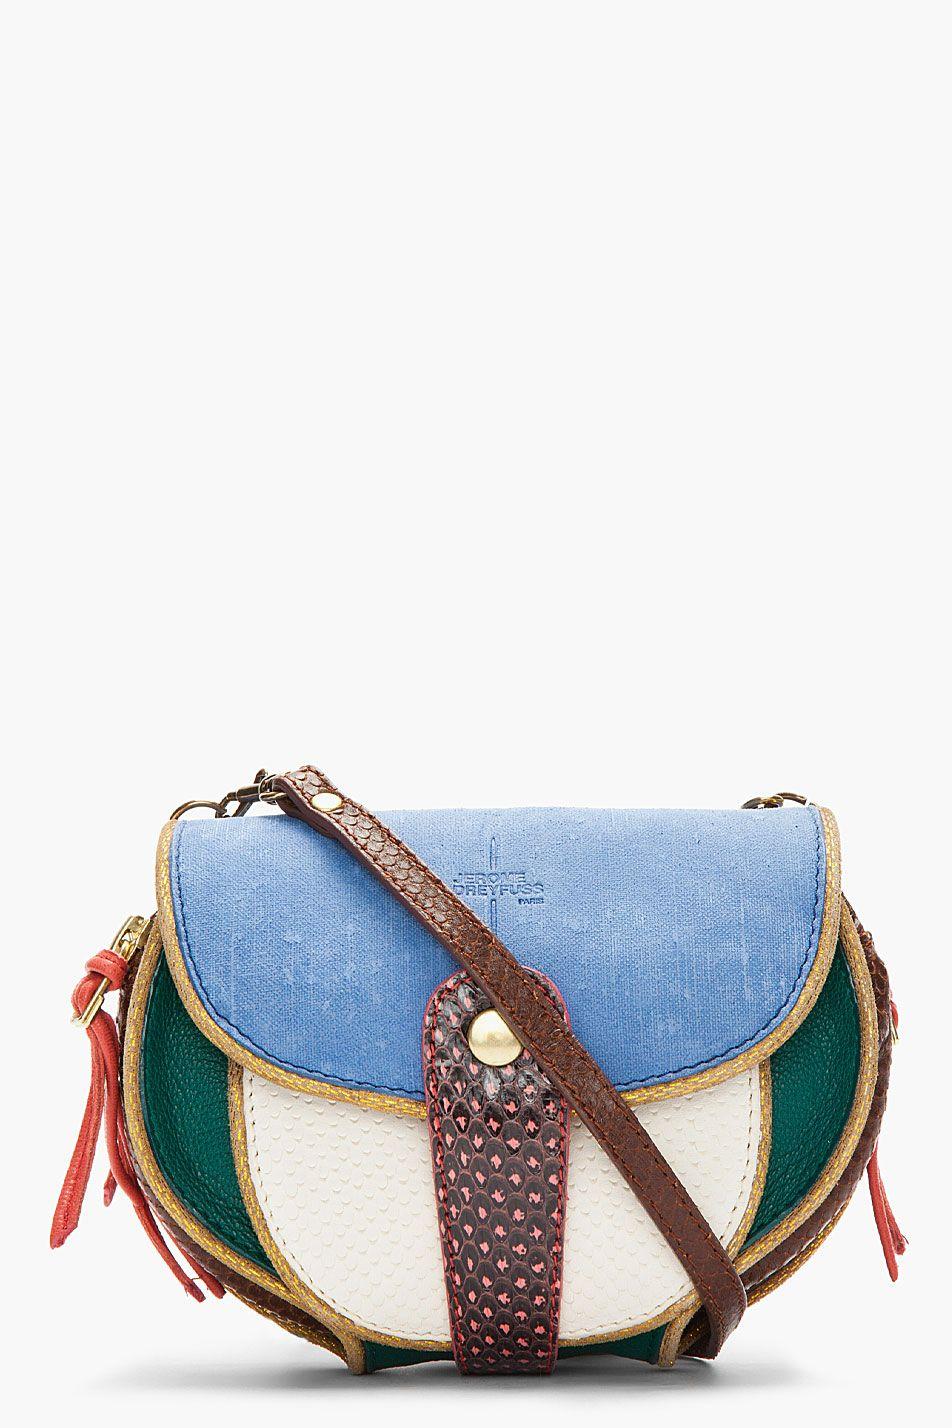 3527077fe572 JEROME DREYFUSS Mini Blue Suede   Snakeskin Momo Disco Bag